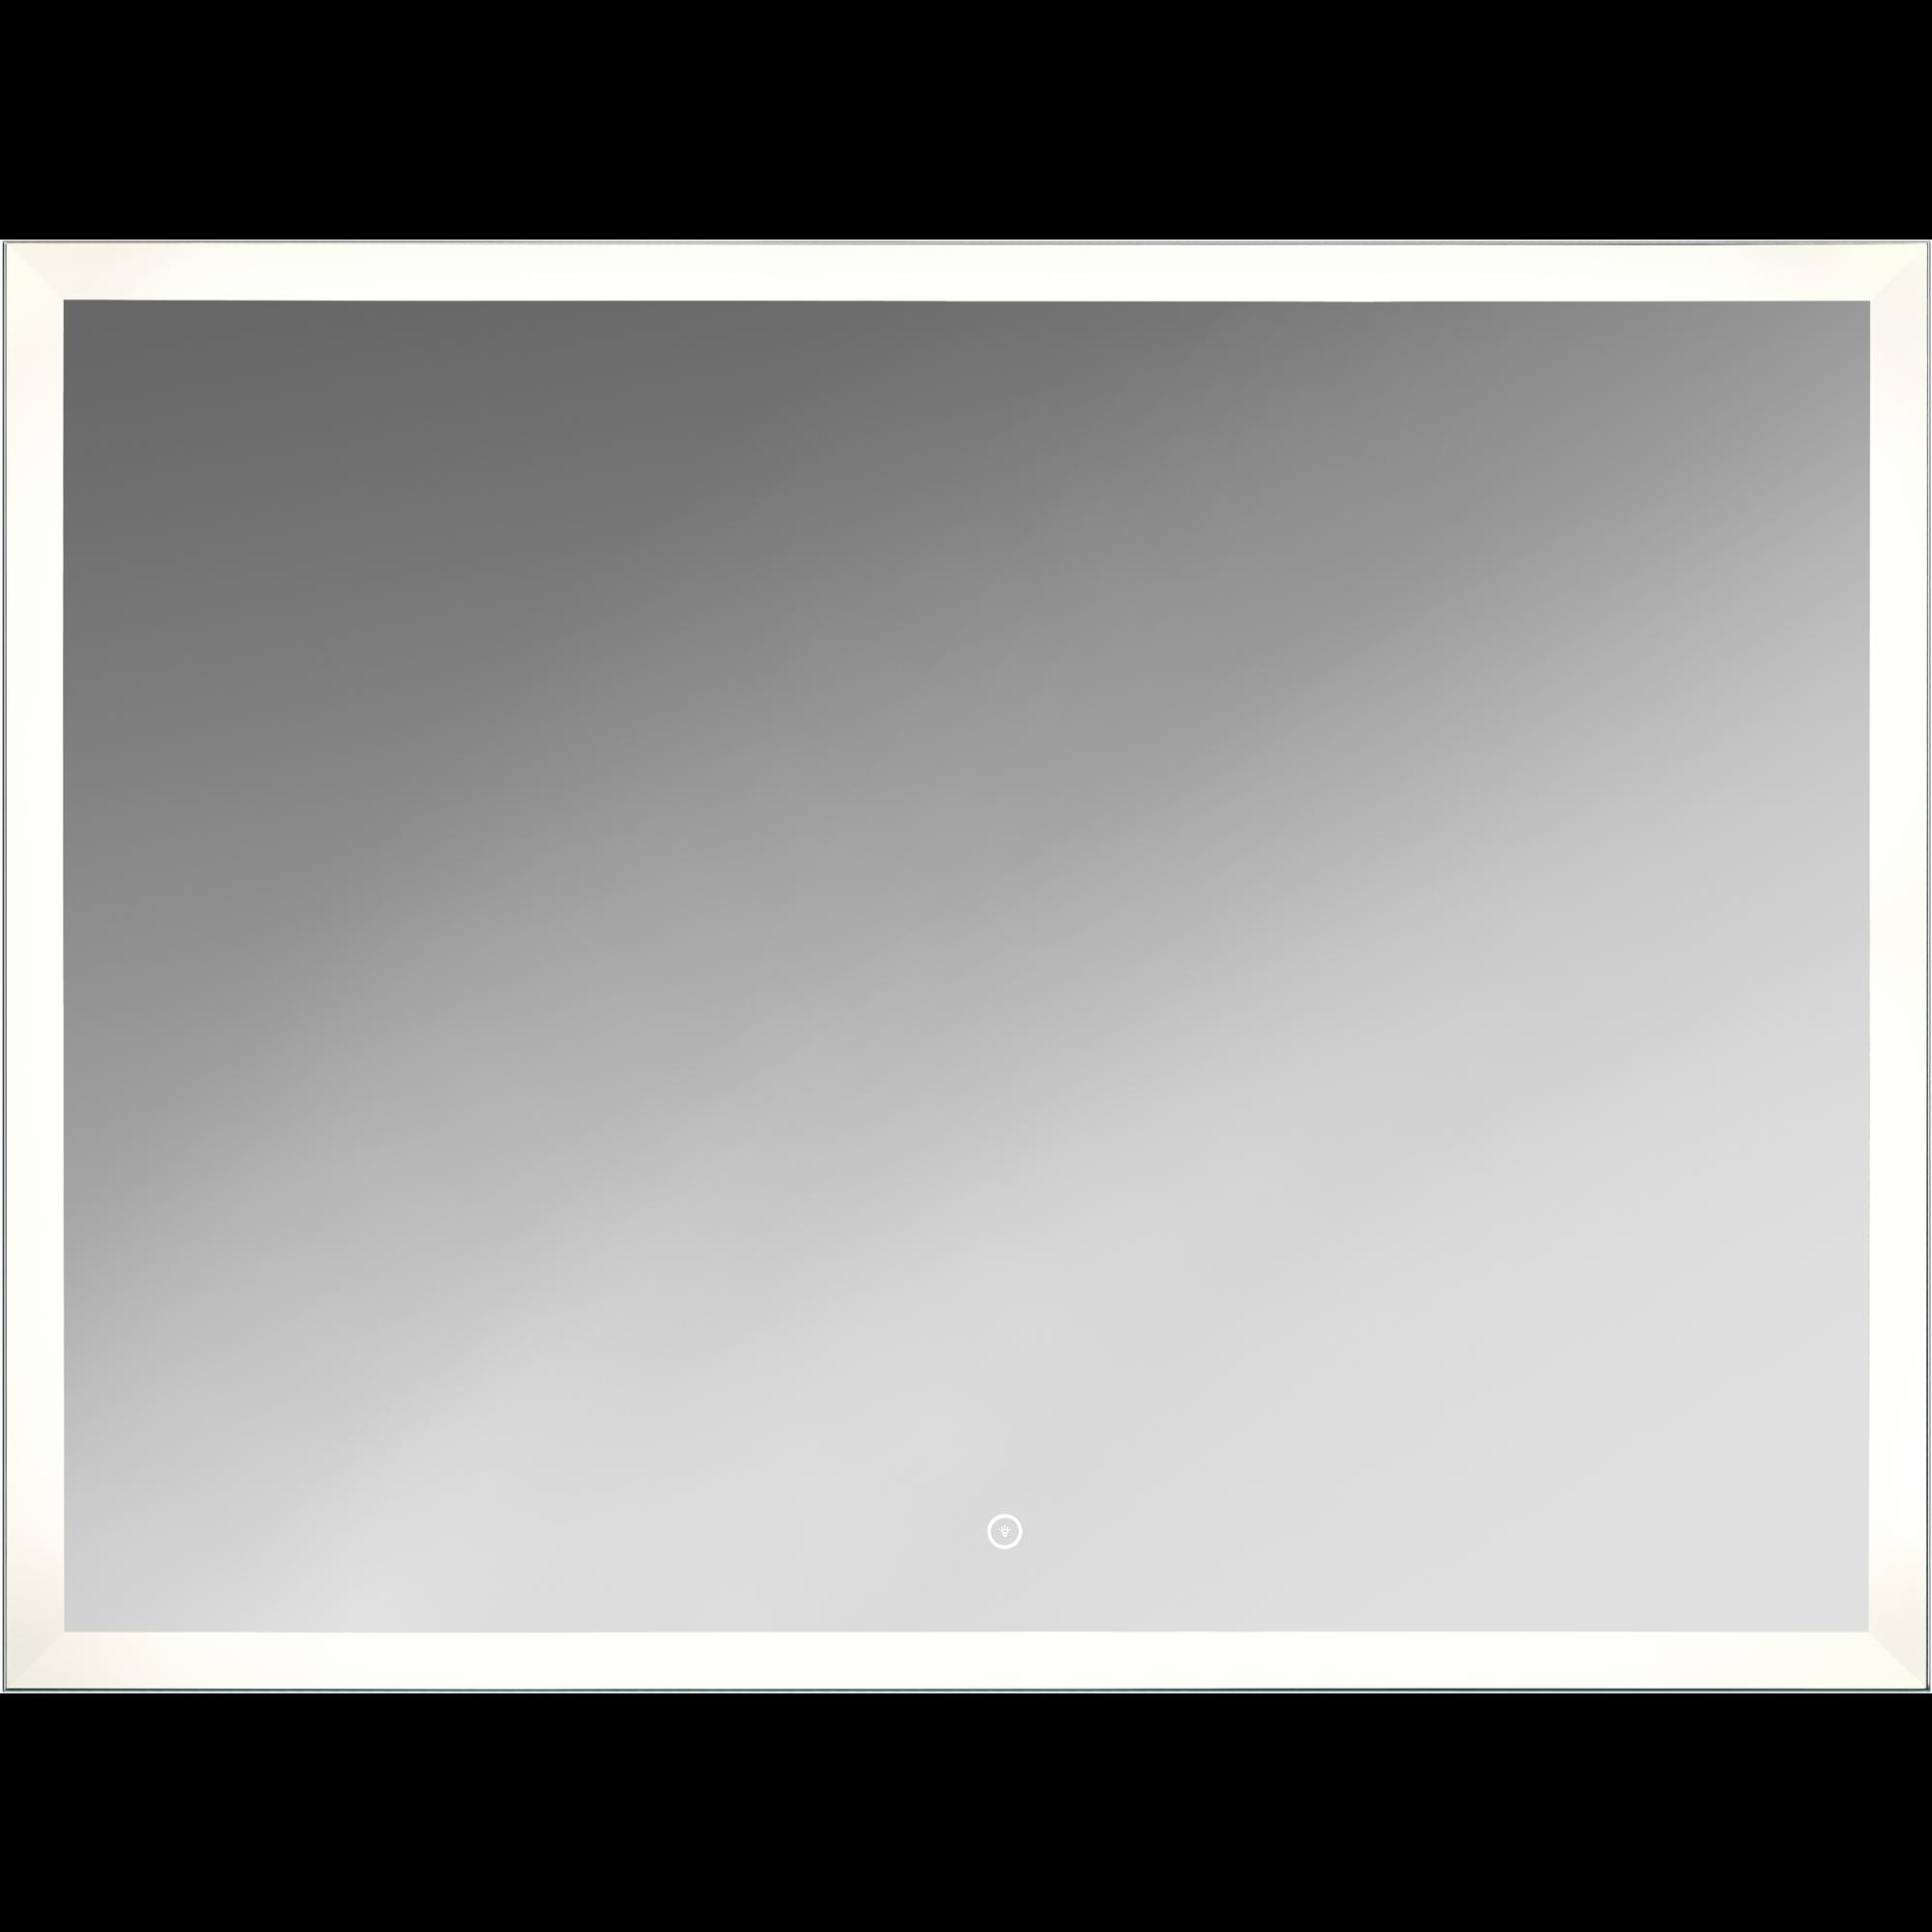 Kristall Form Led Spiegel Sora 80 X 60 Cm ǀ Toom Baumarkt